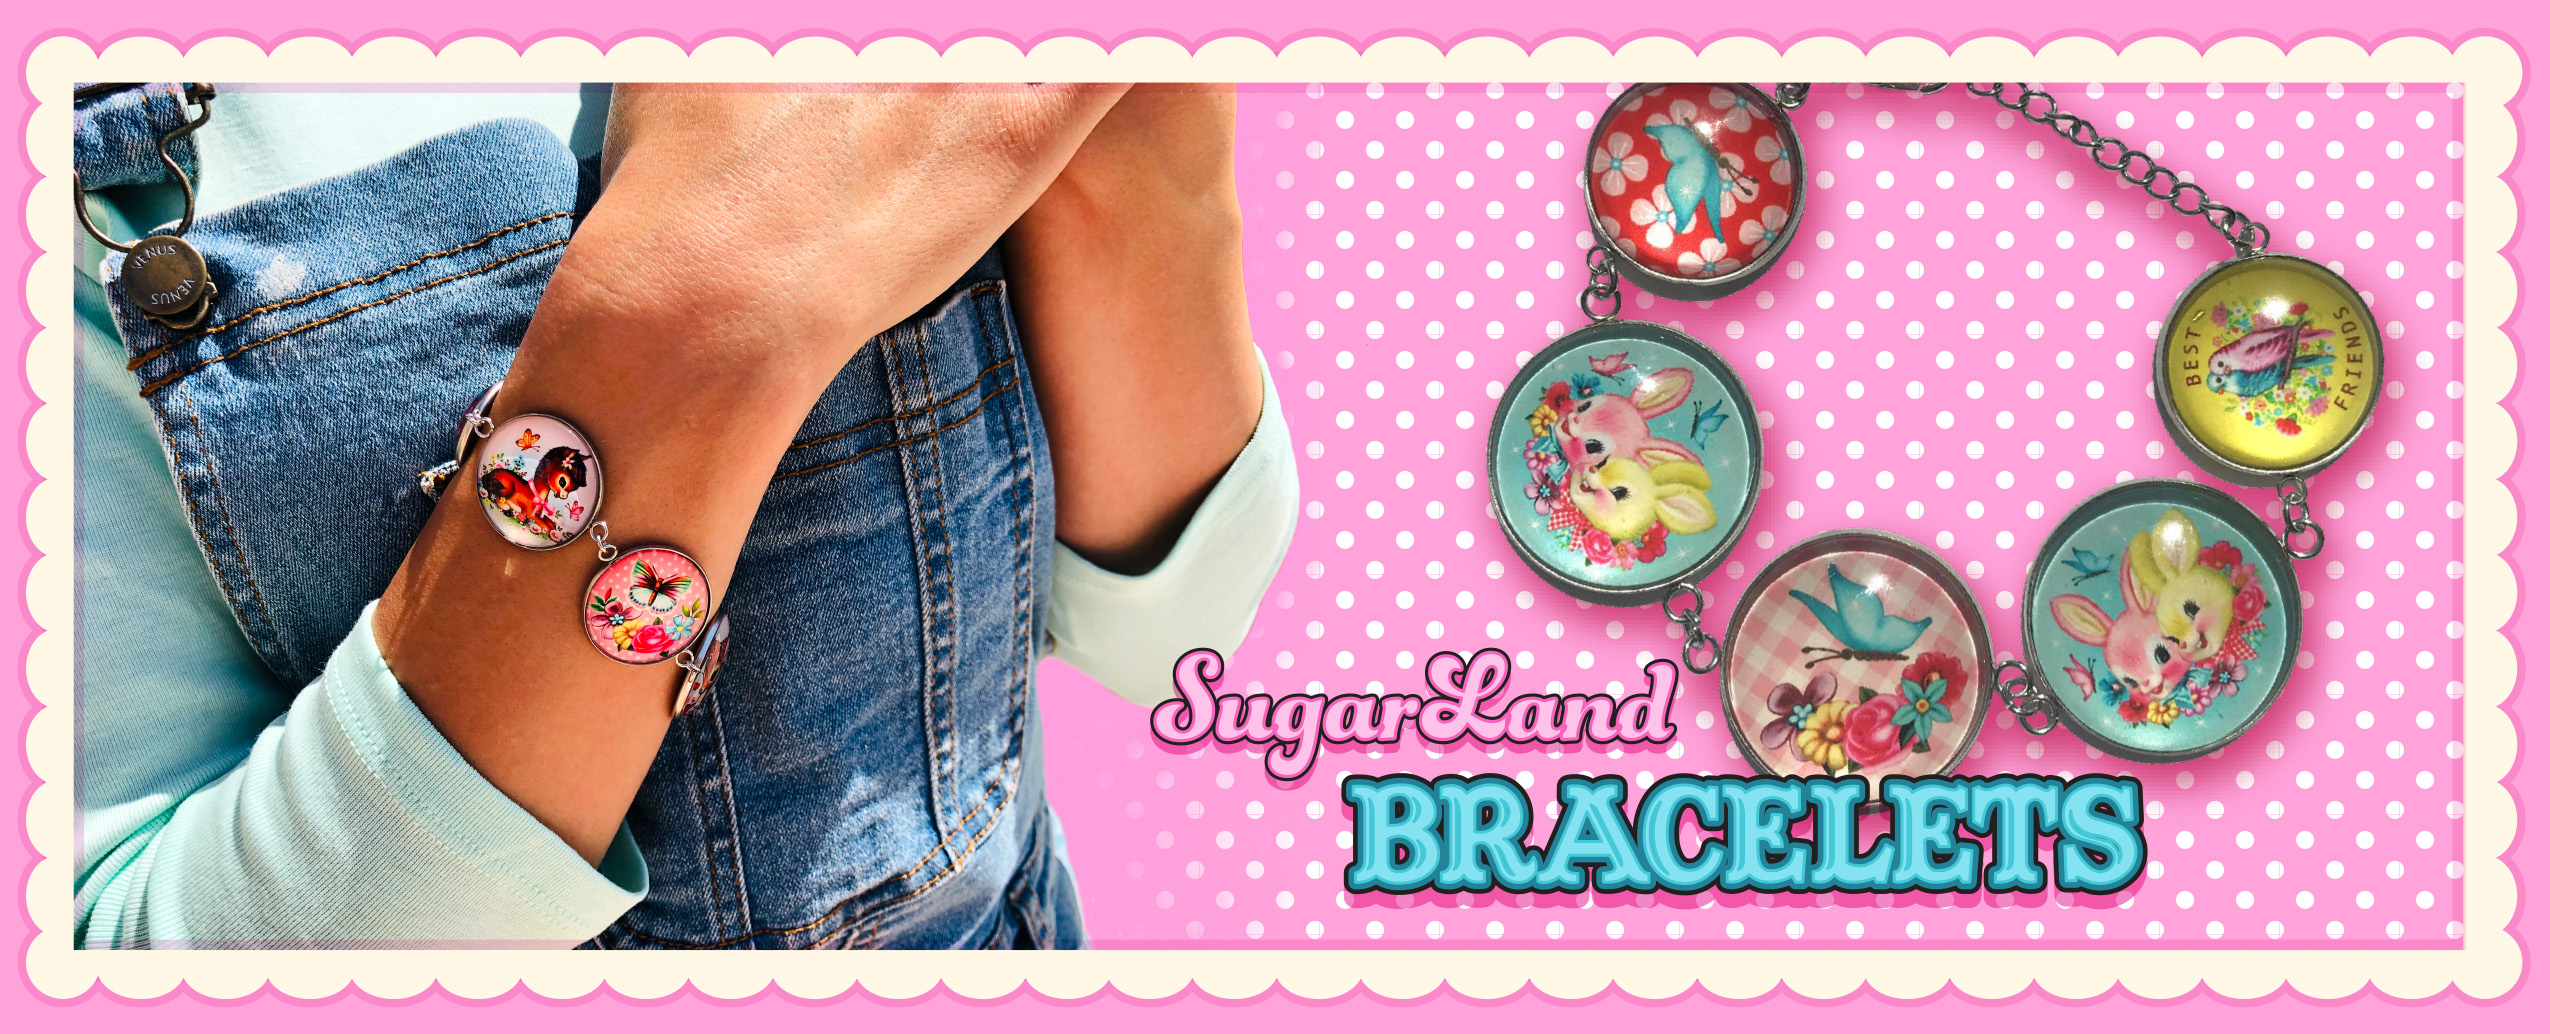 sugarland-catagory-bracelets-rev.jpg